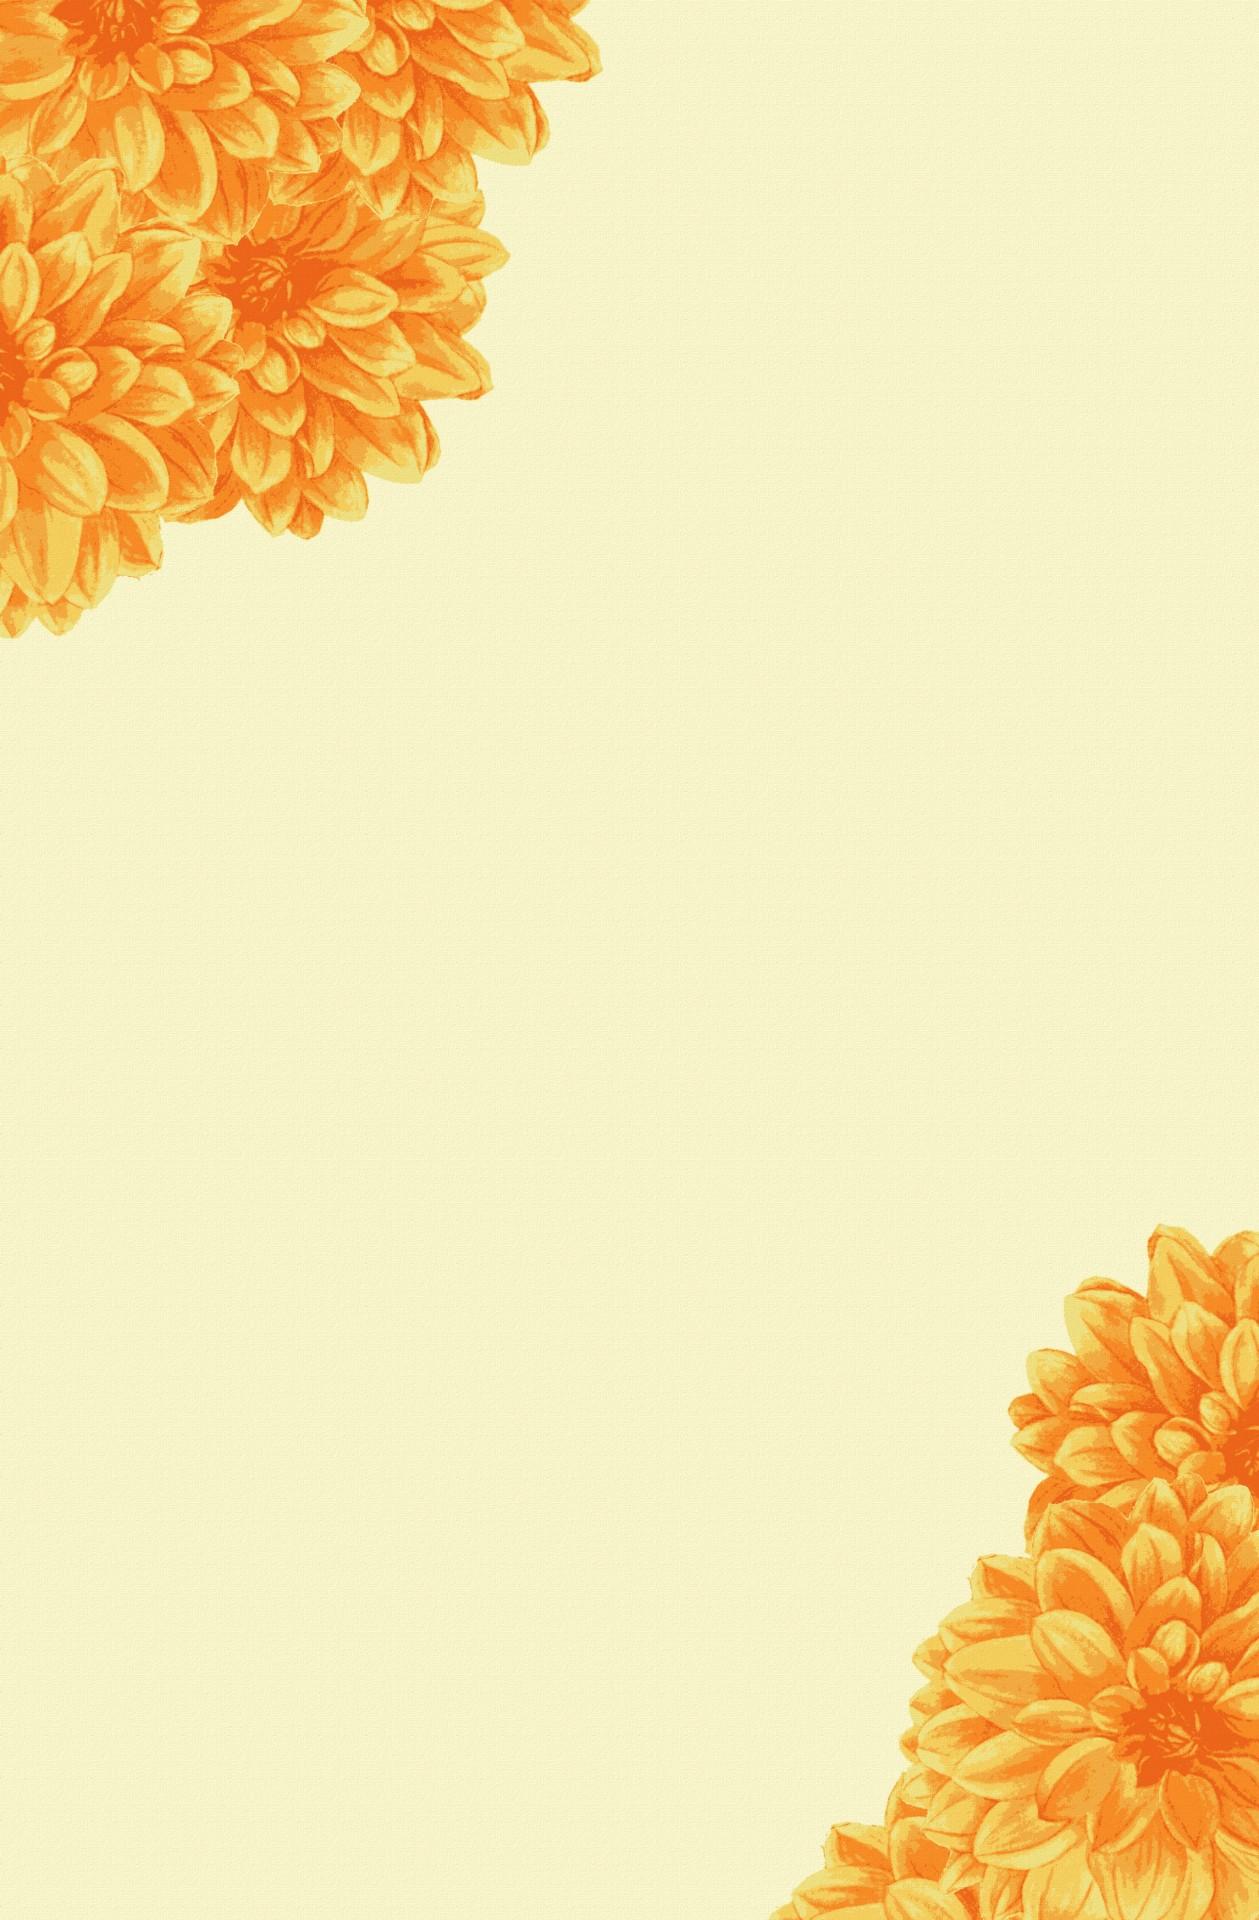 Download Free Photo Of Dahlia Dahlias Flower Flowers Orange